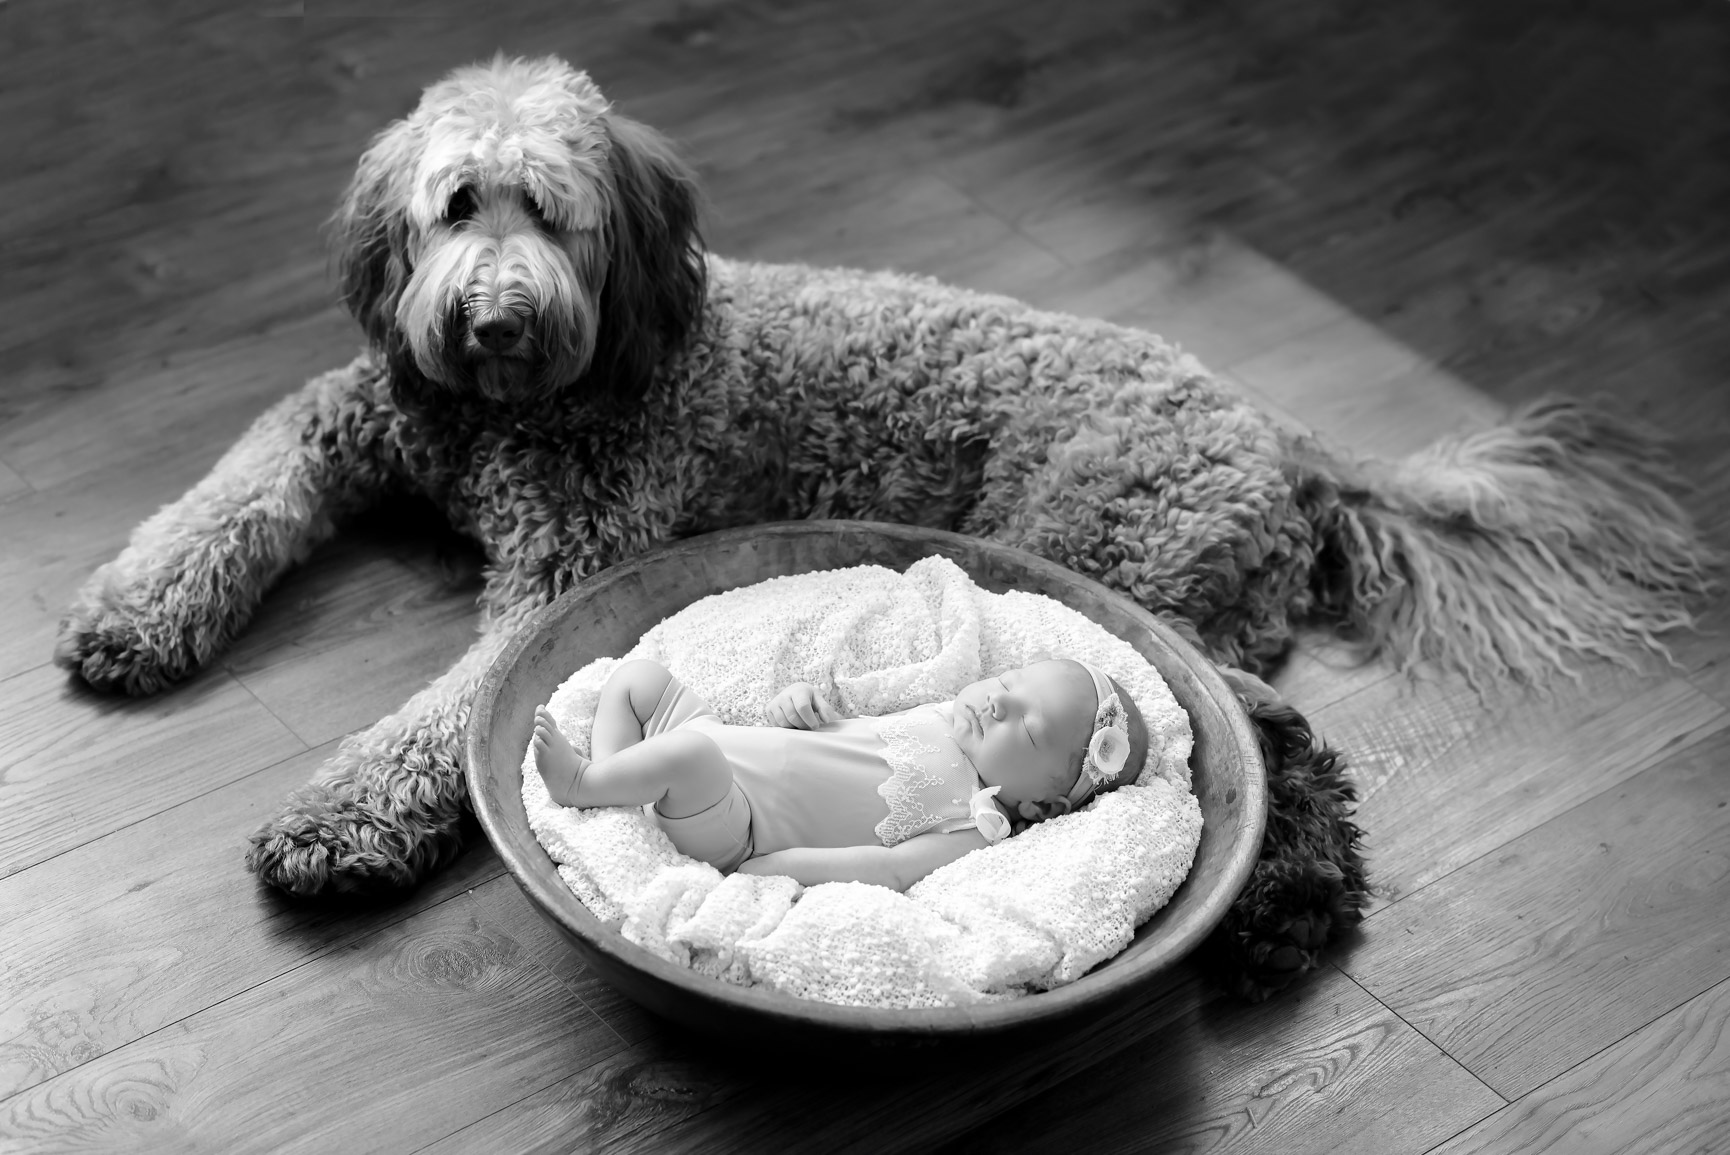 Baby Bowen - Jamie & MelissaBaby BowenDSC_8593-Edit-Edit.jpg